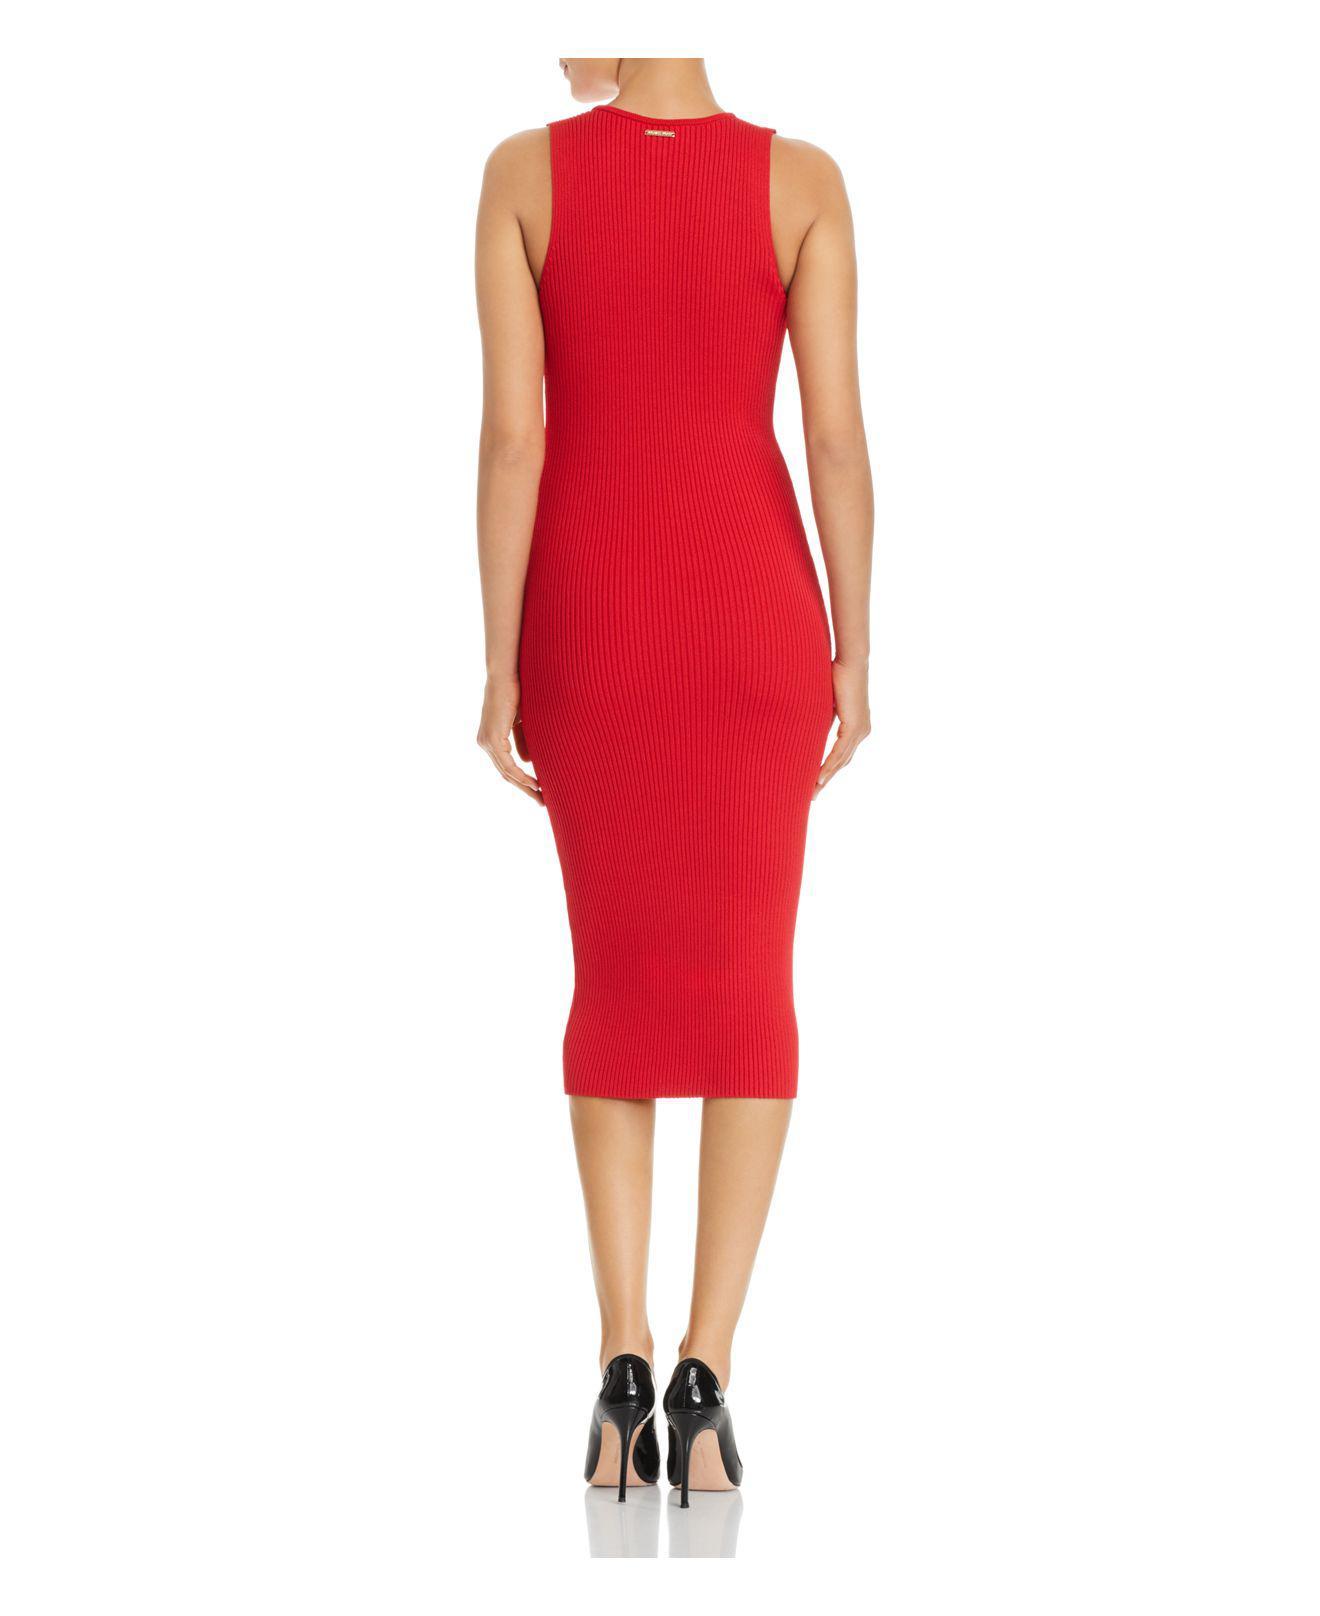 d7cd4babb2 MICHAEL Michael Kors V-neck Rib-knit Sweater Dress in Red - Lyst